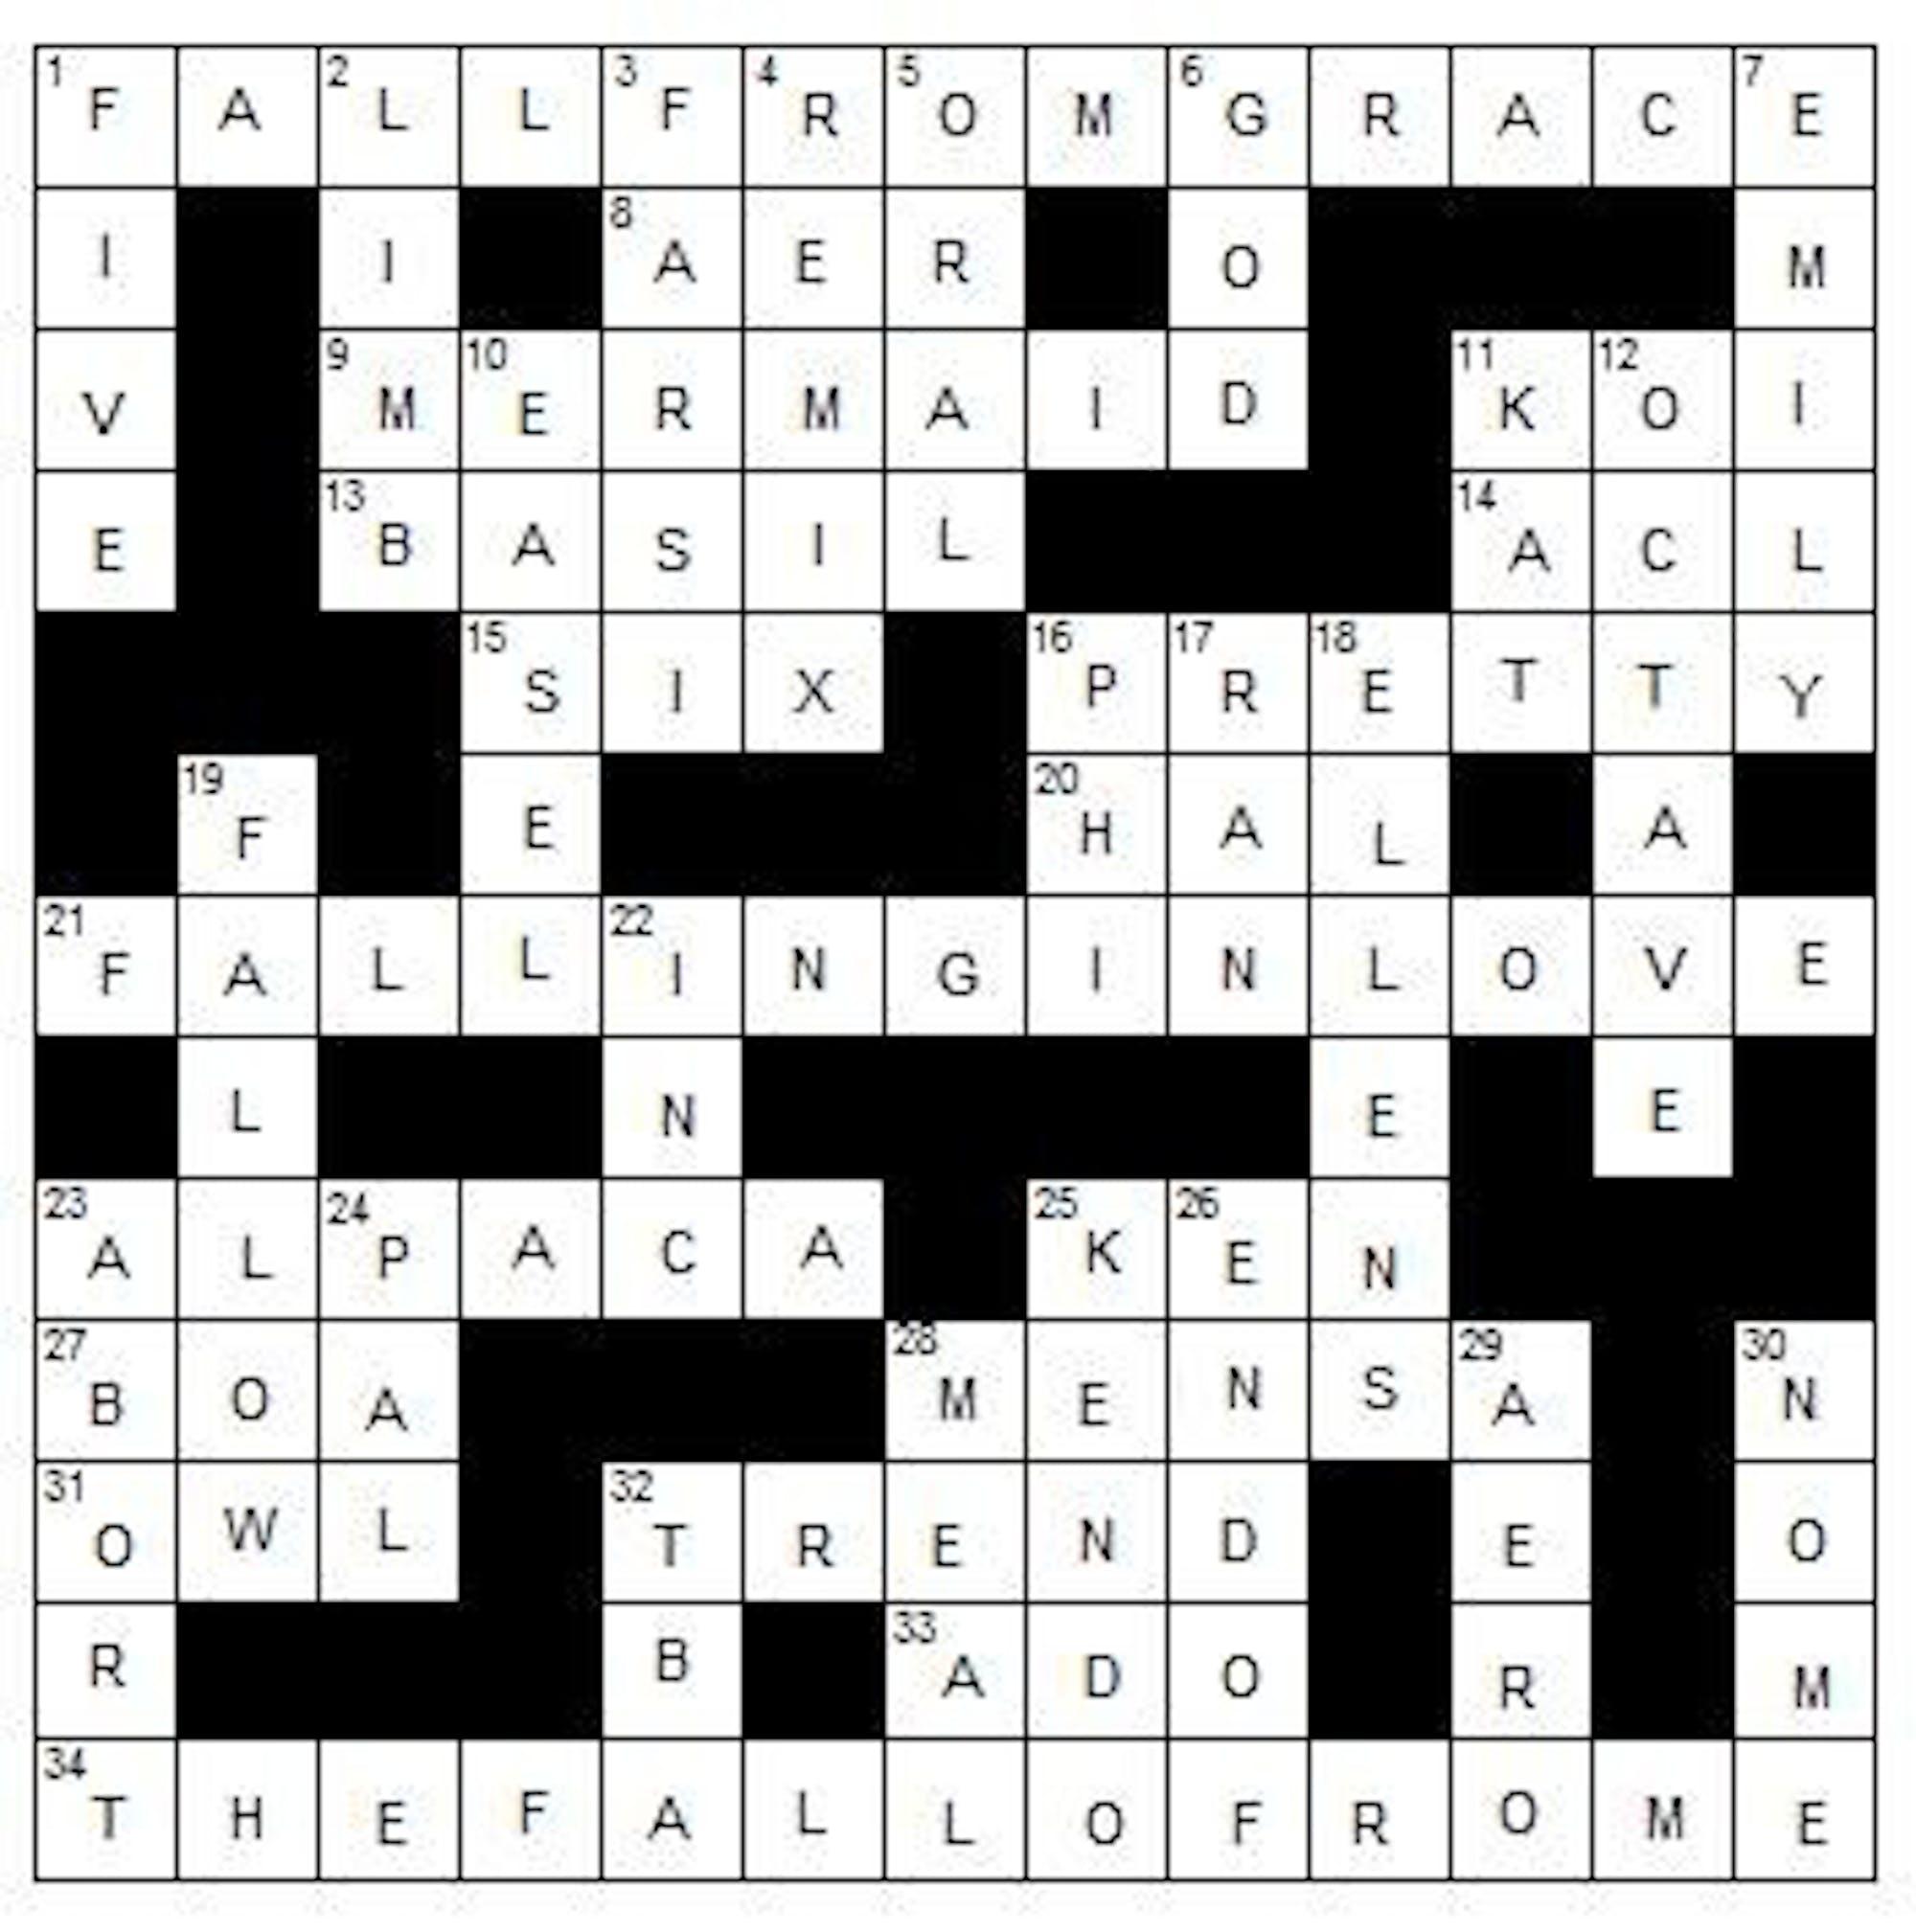 10-25-11_SOLUTION